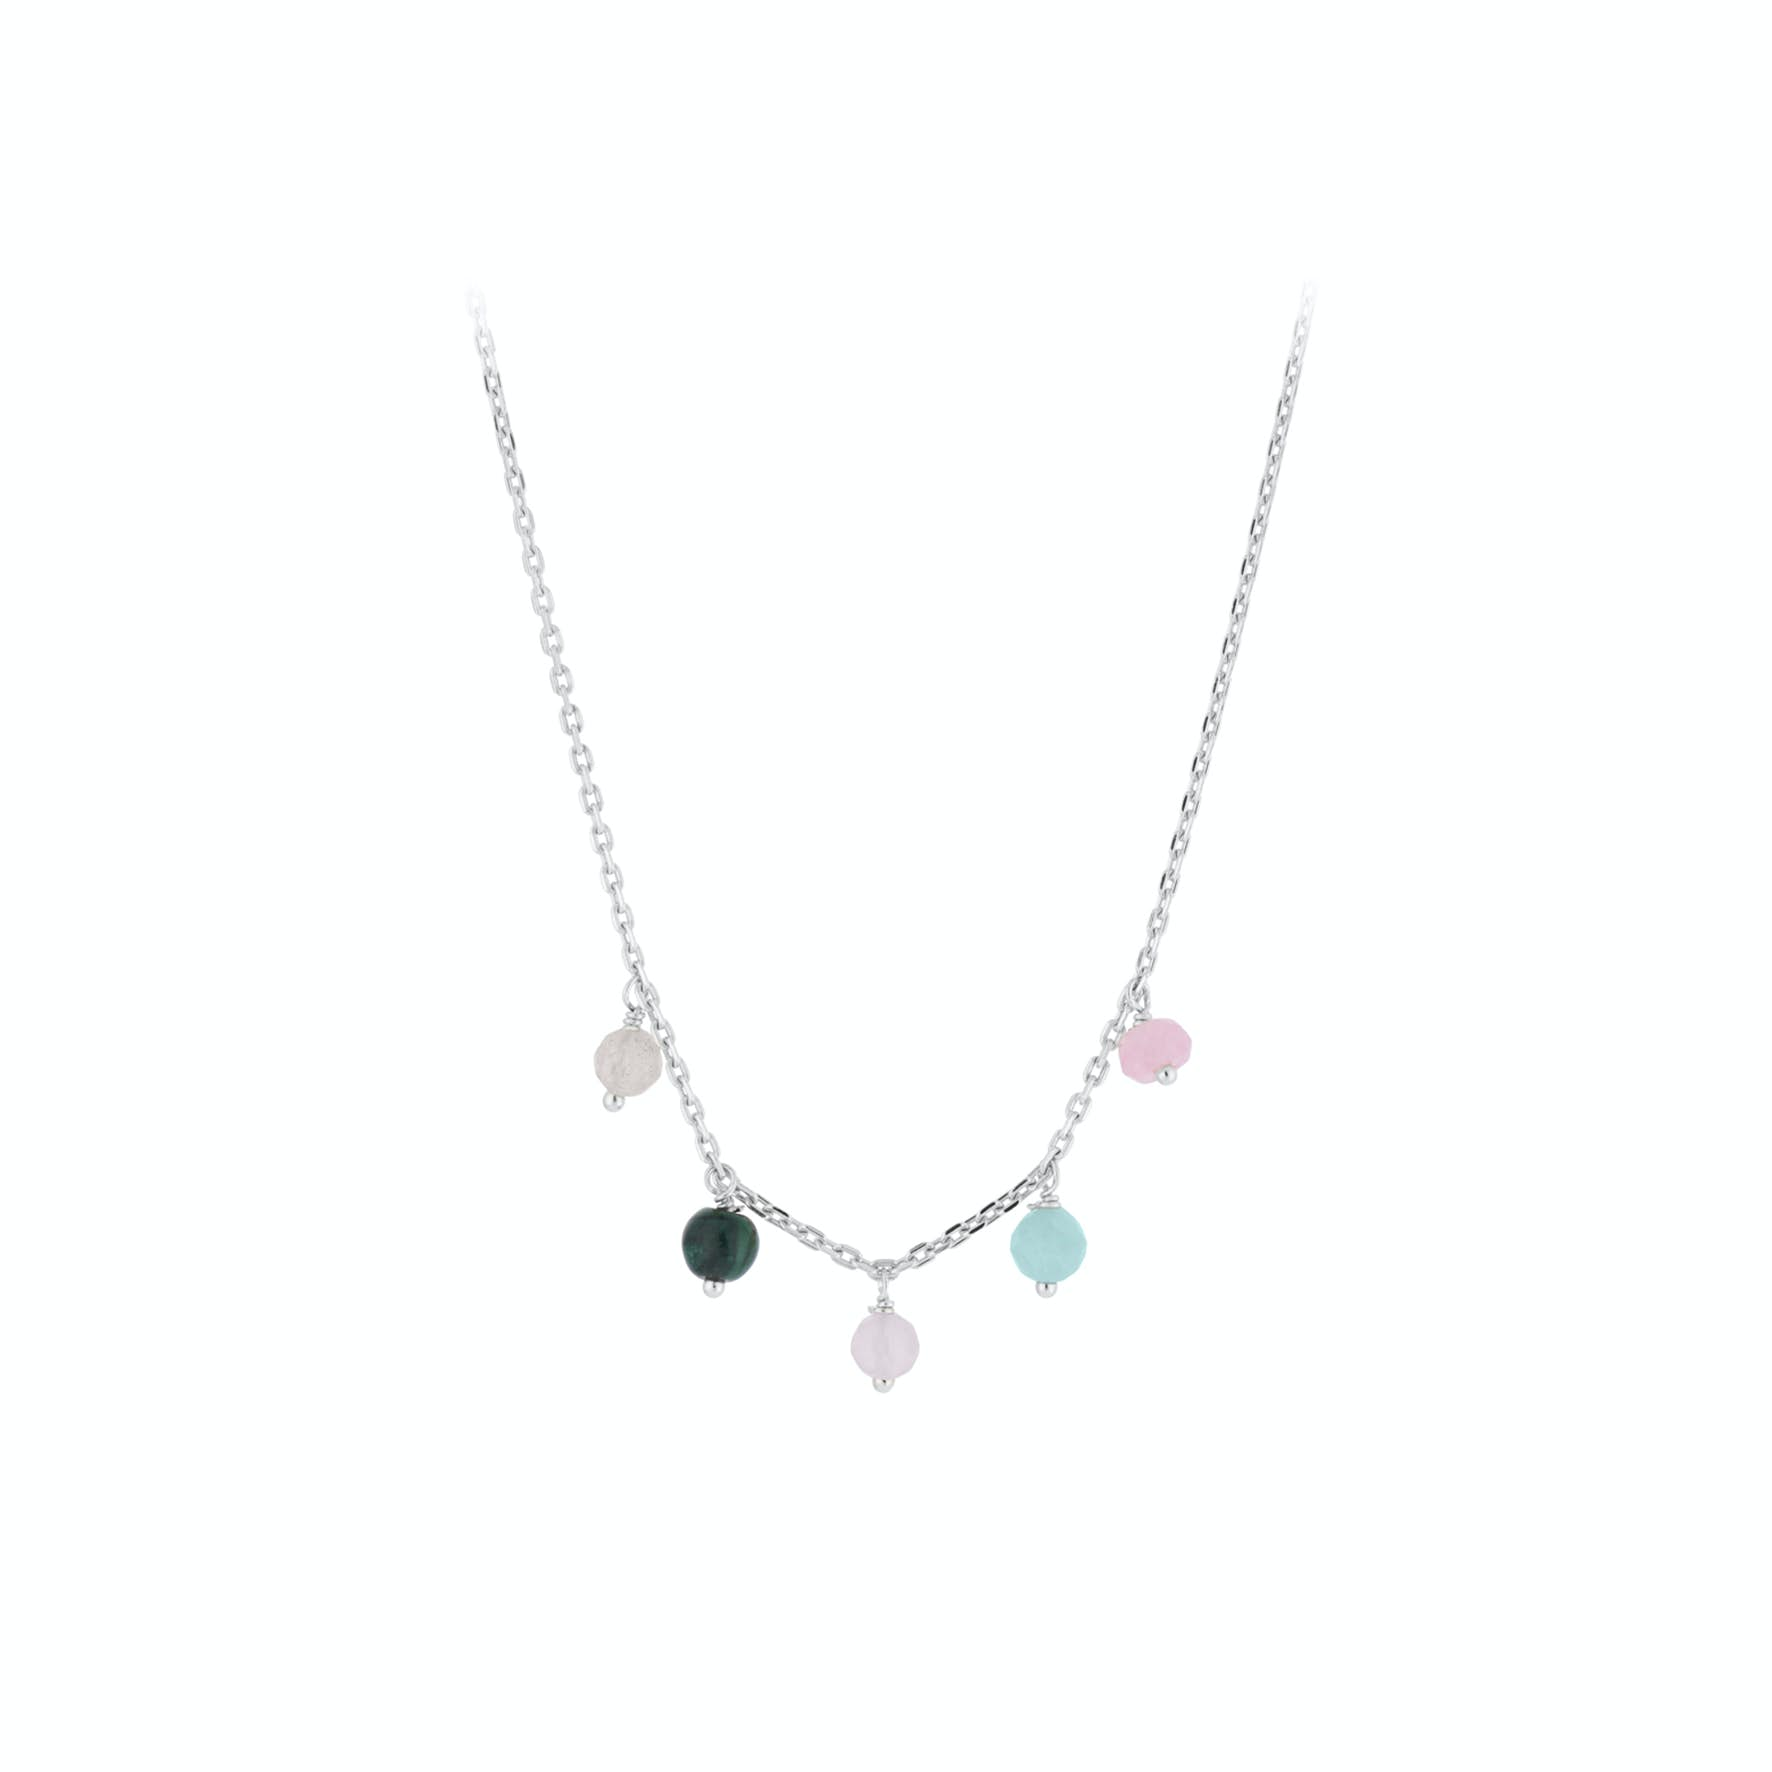 Harmony Necklace fra Pernille Corydon i Sølv Sterling 925